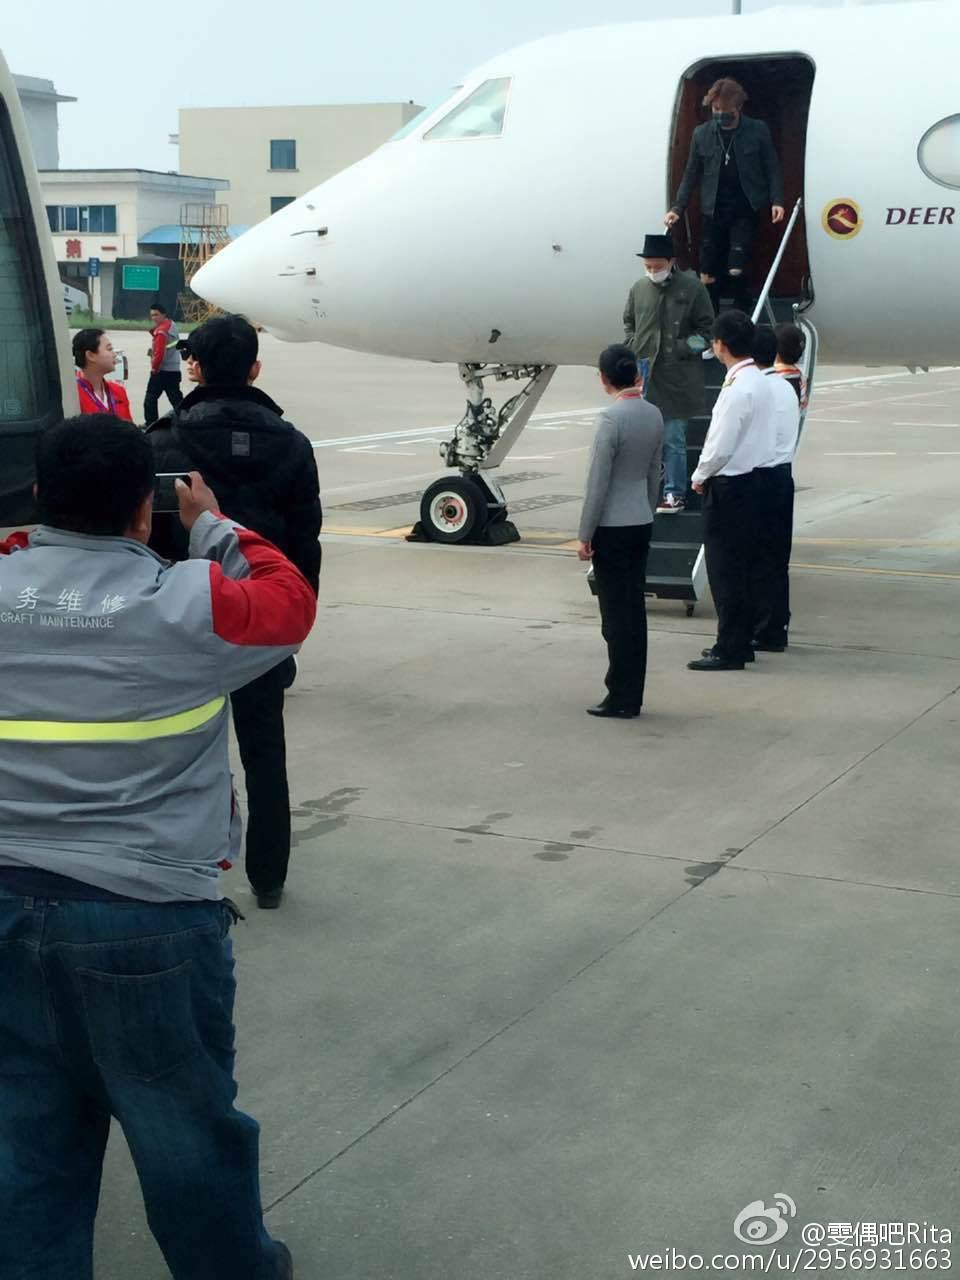 BIGBANG Arrival Changsha 2016-03-26 雯偶吧Rita (2)